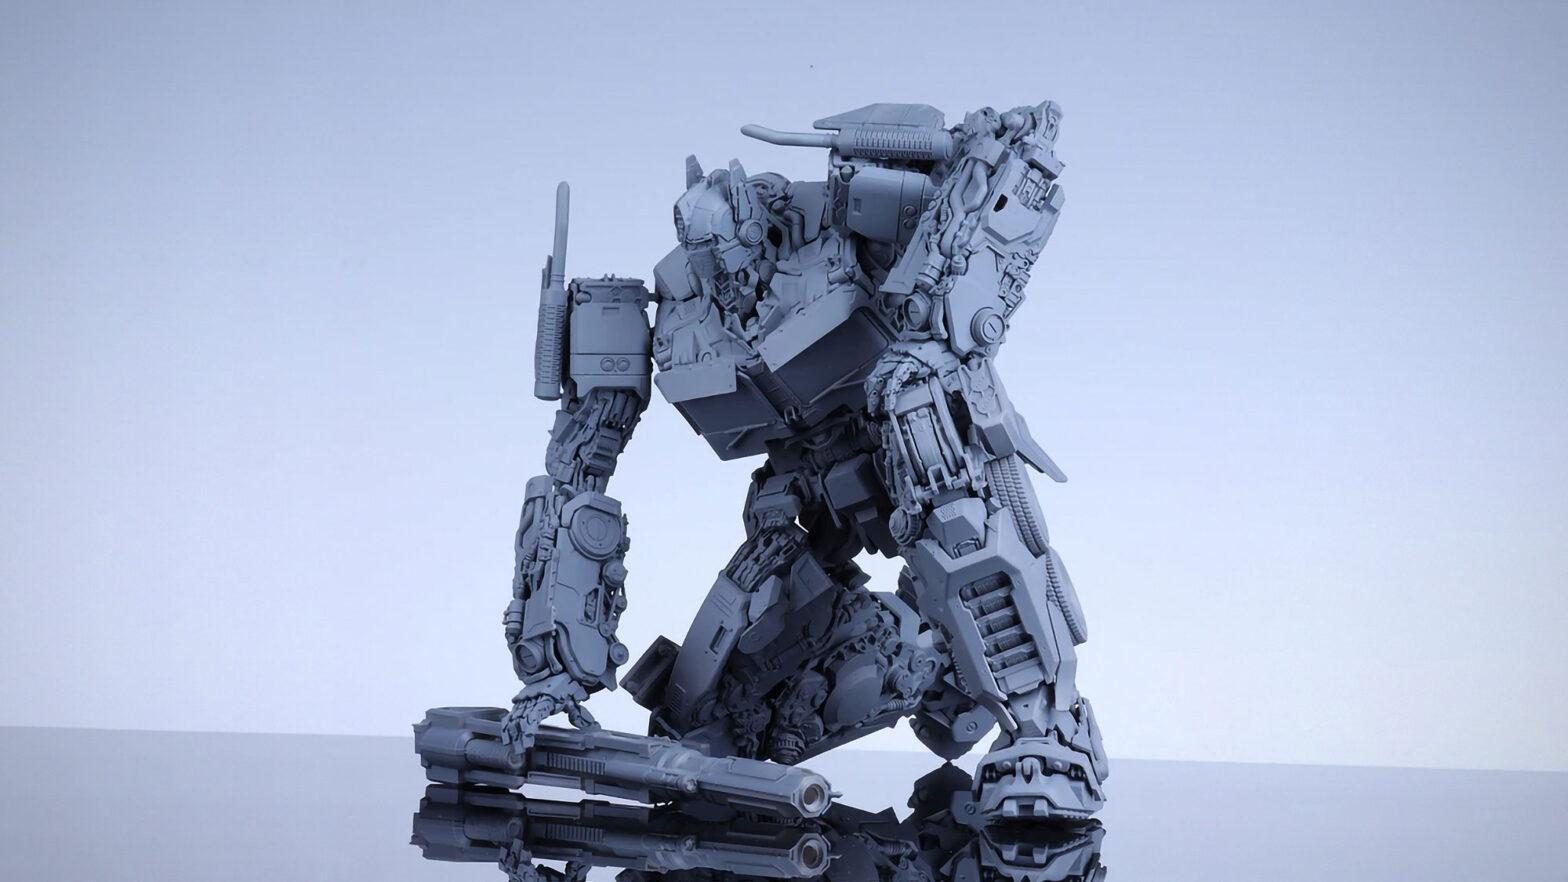 Yolopark x Soskill Optimus Prime Model Kit